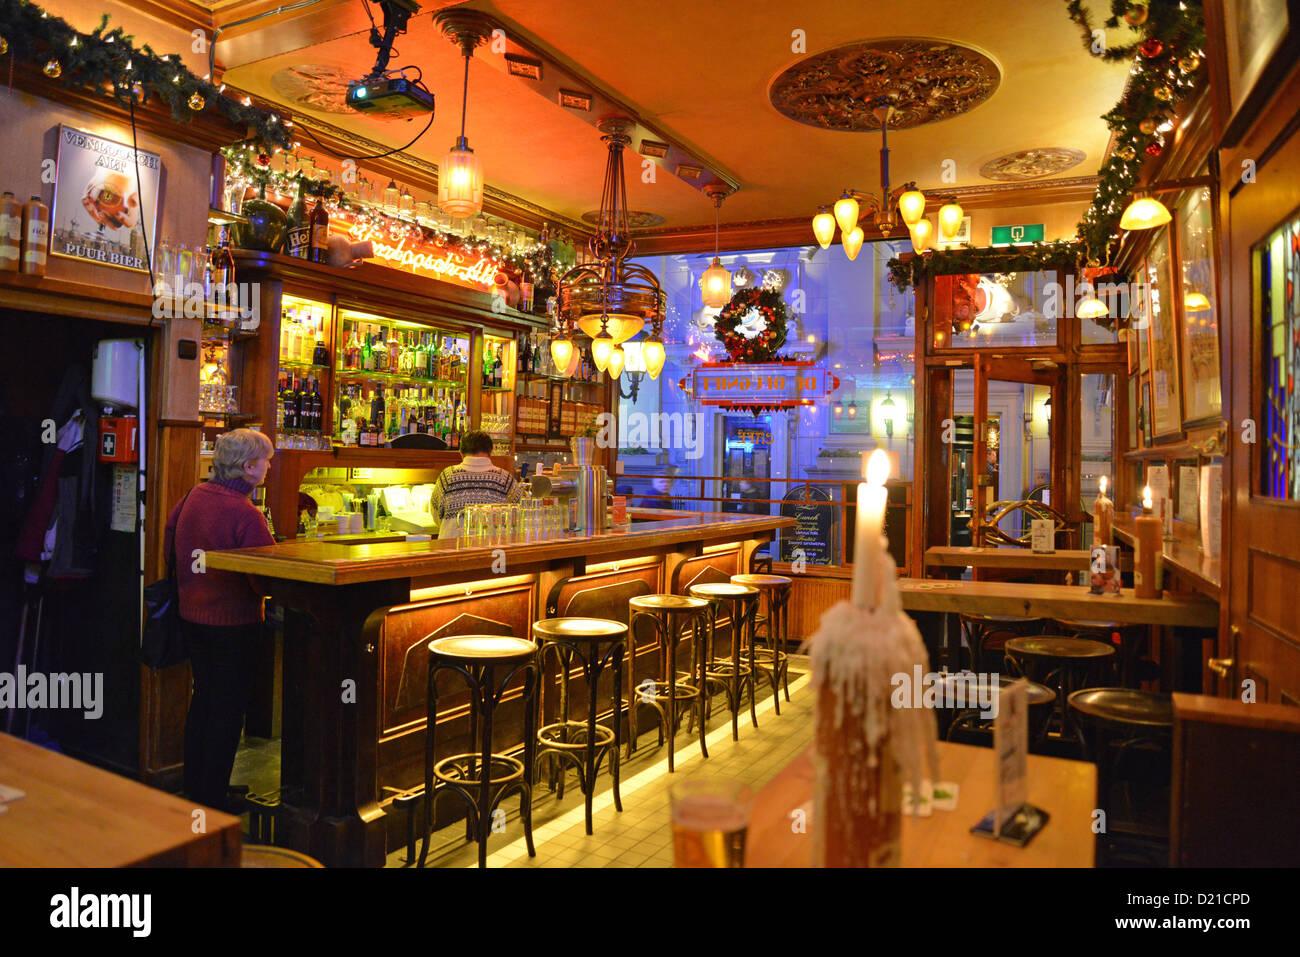 Brown Cafe Amsterdam Stockfotos & Brown Cafe Amsterdam Bilder - Alamy